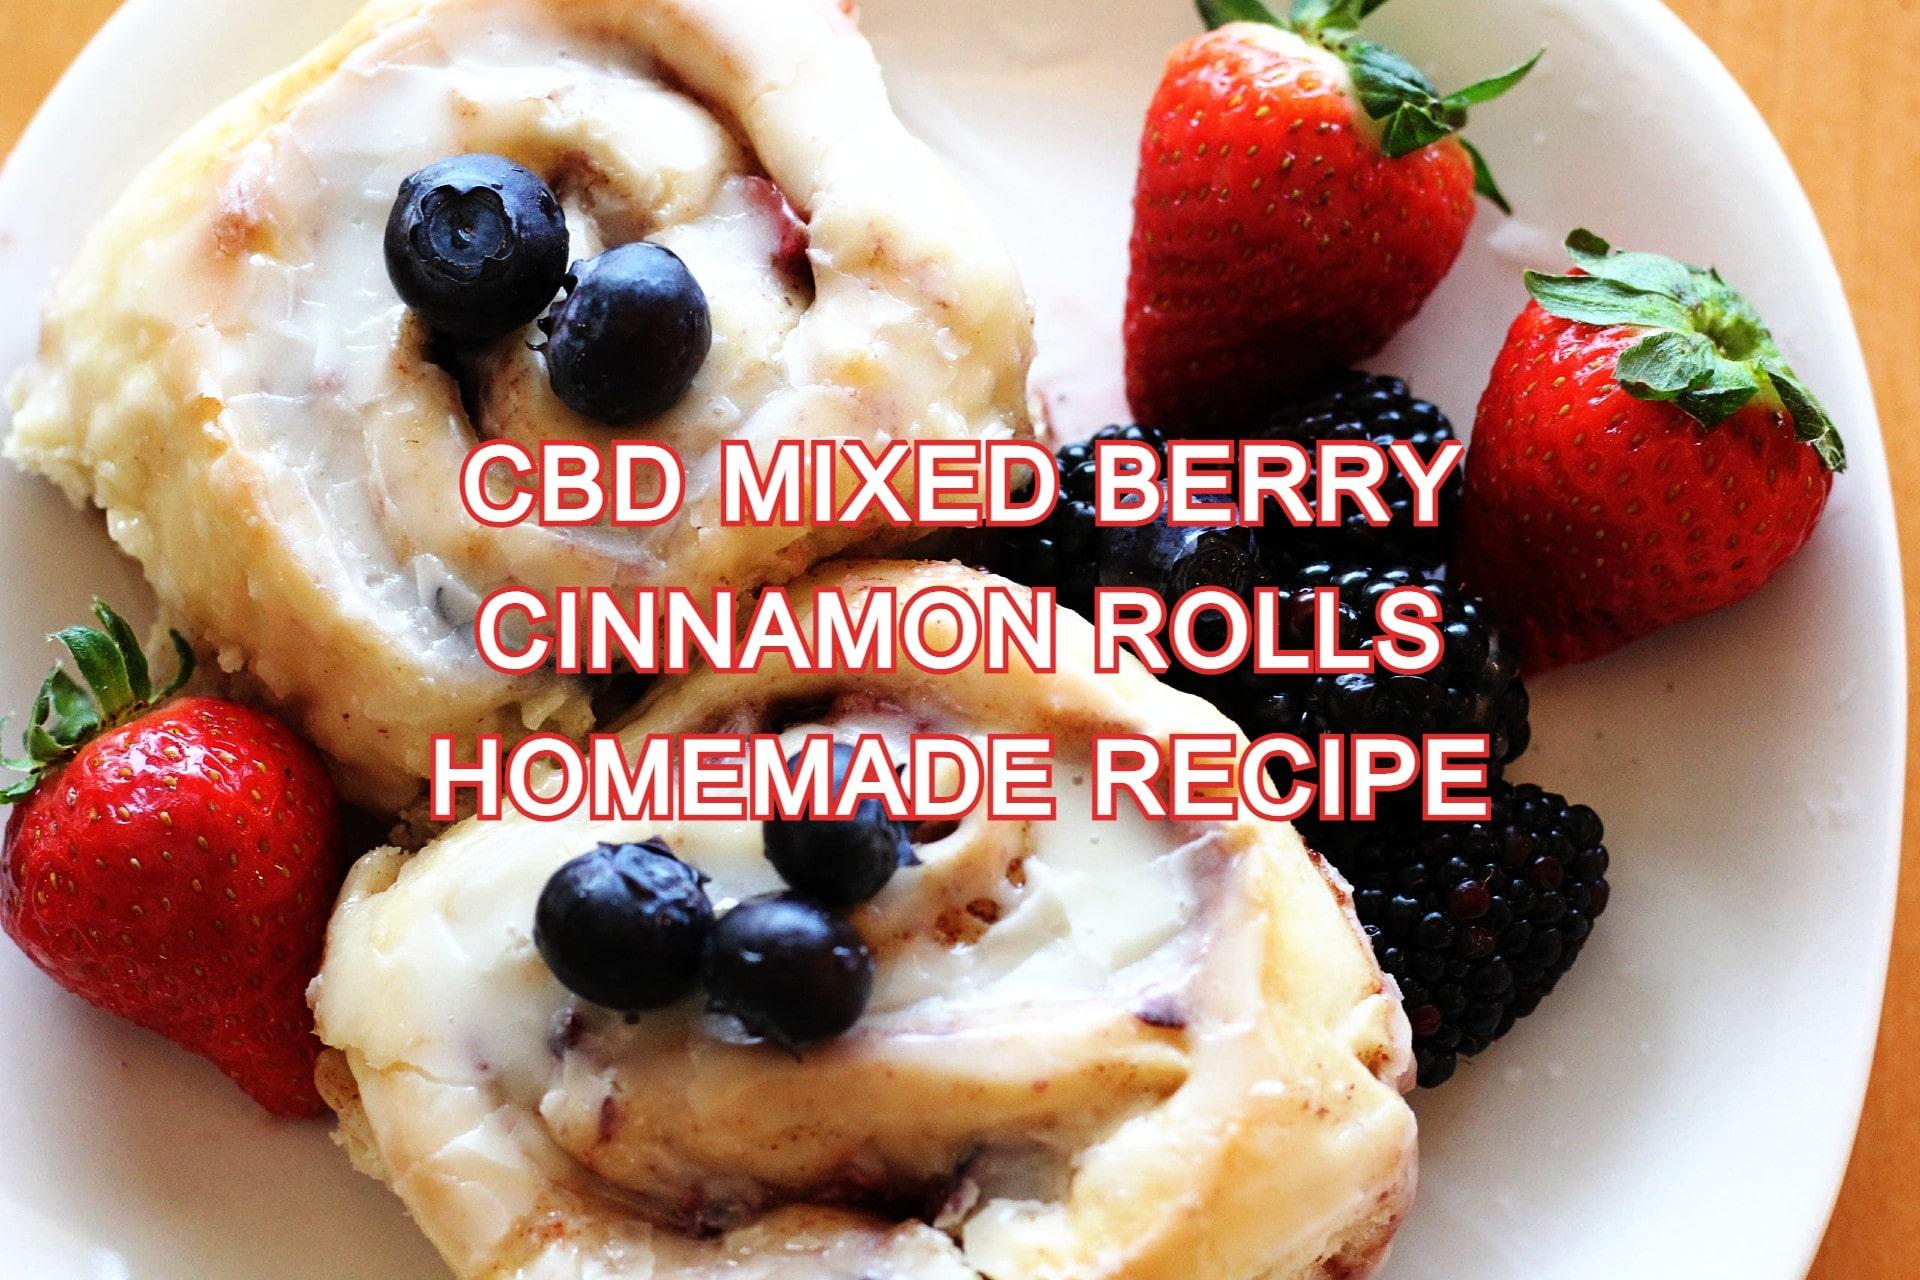 CBD Mixed Berry Cinnamon Rolls Homemade Recipe